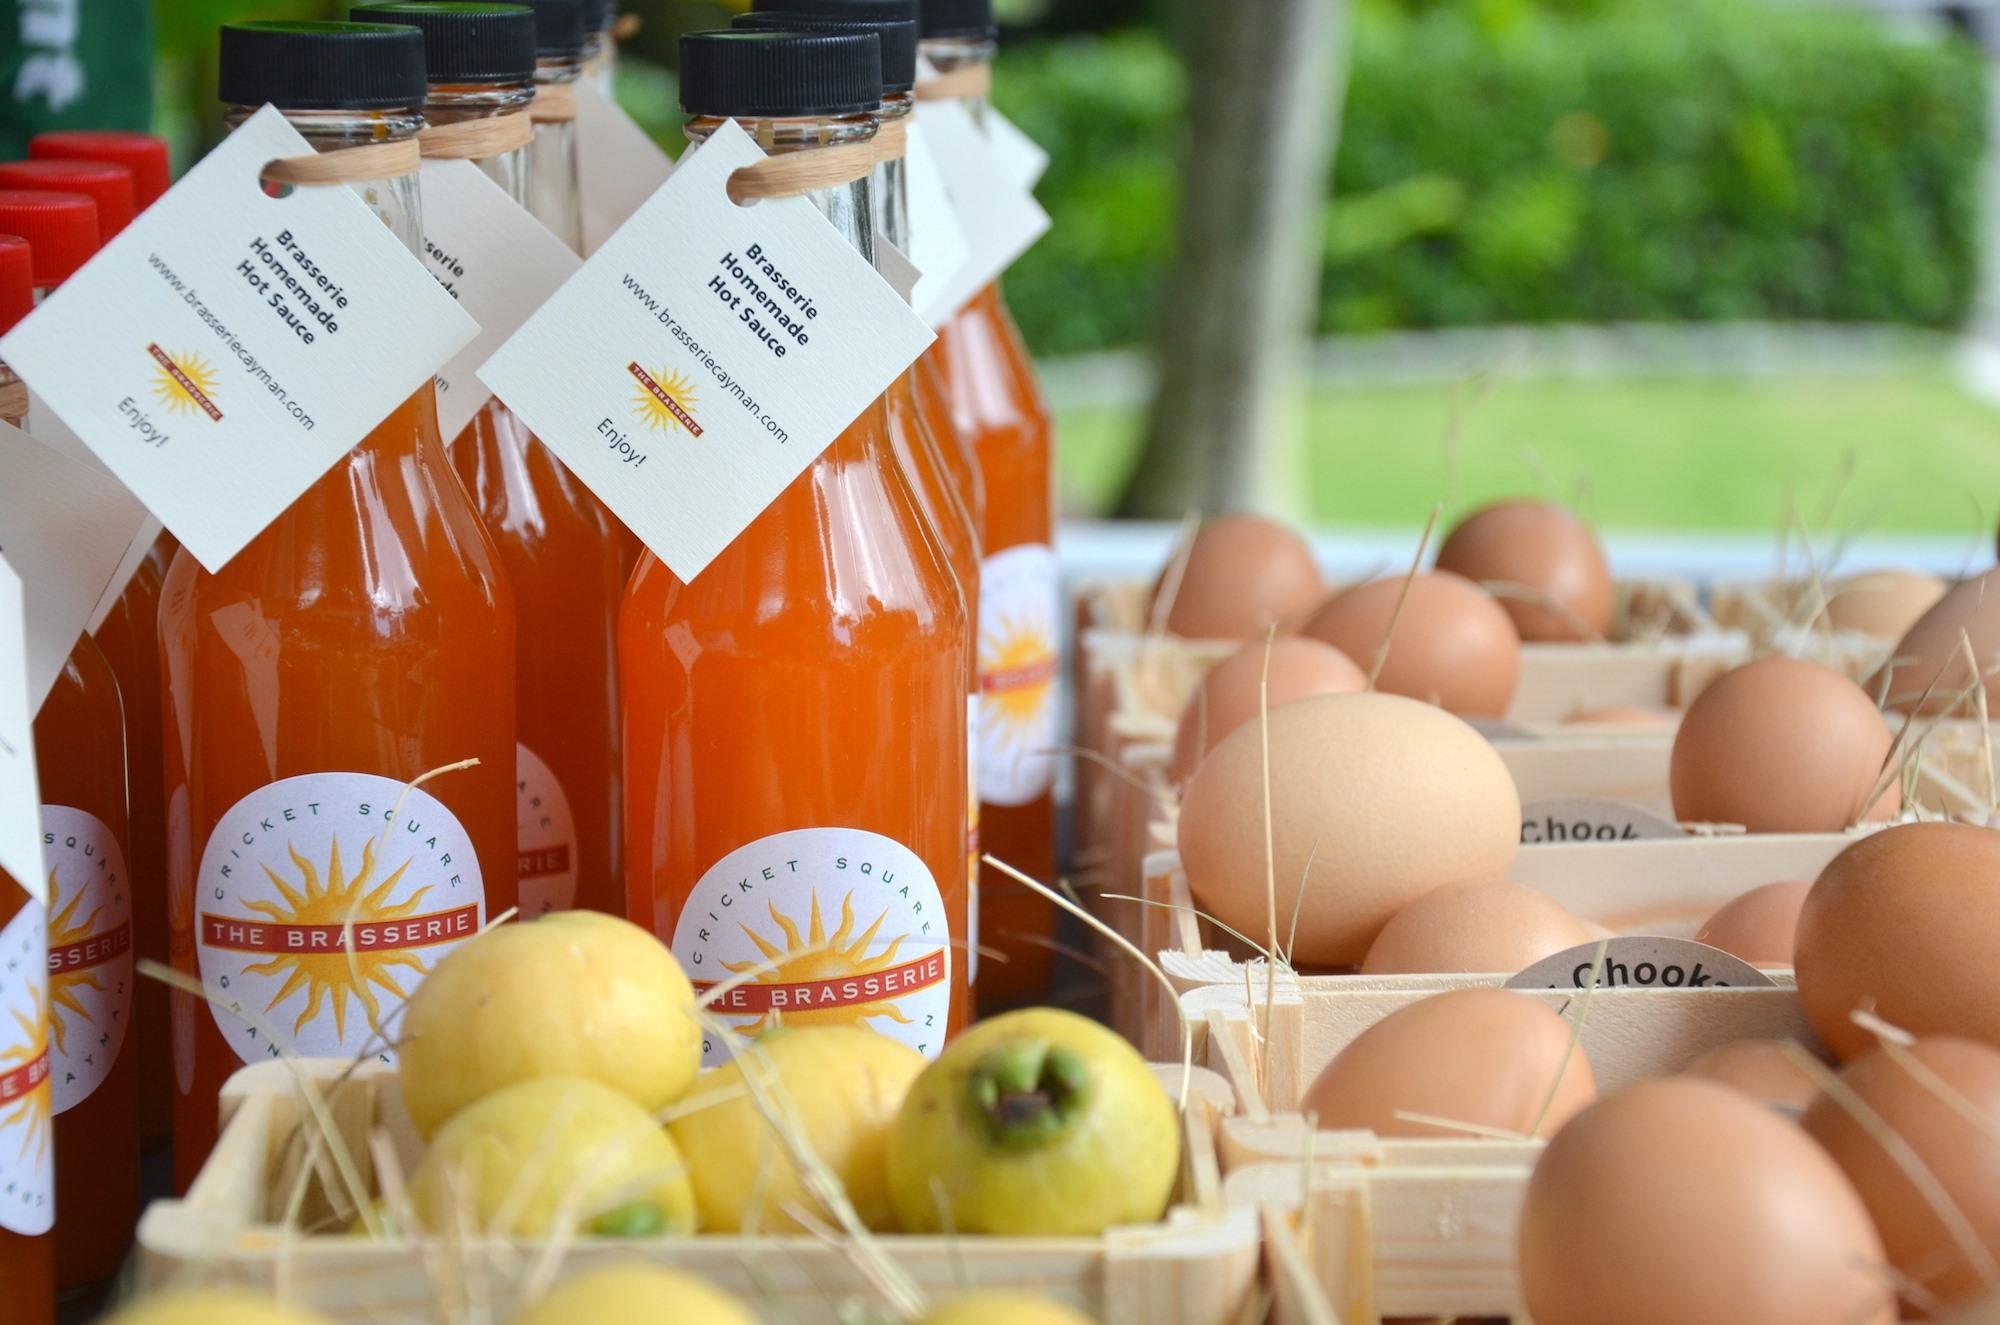 Brasserie-market-produce